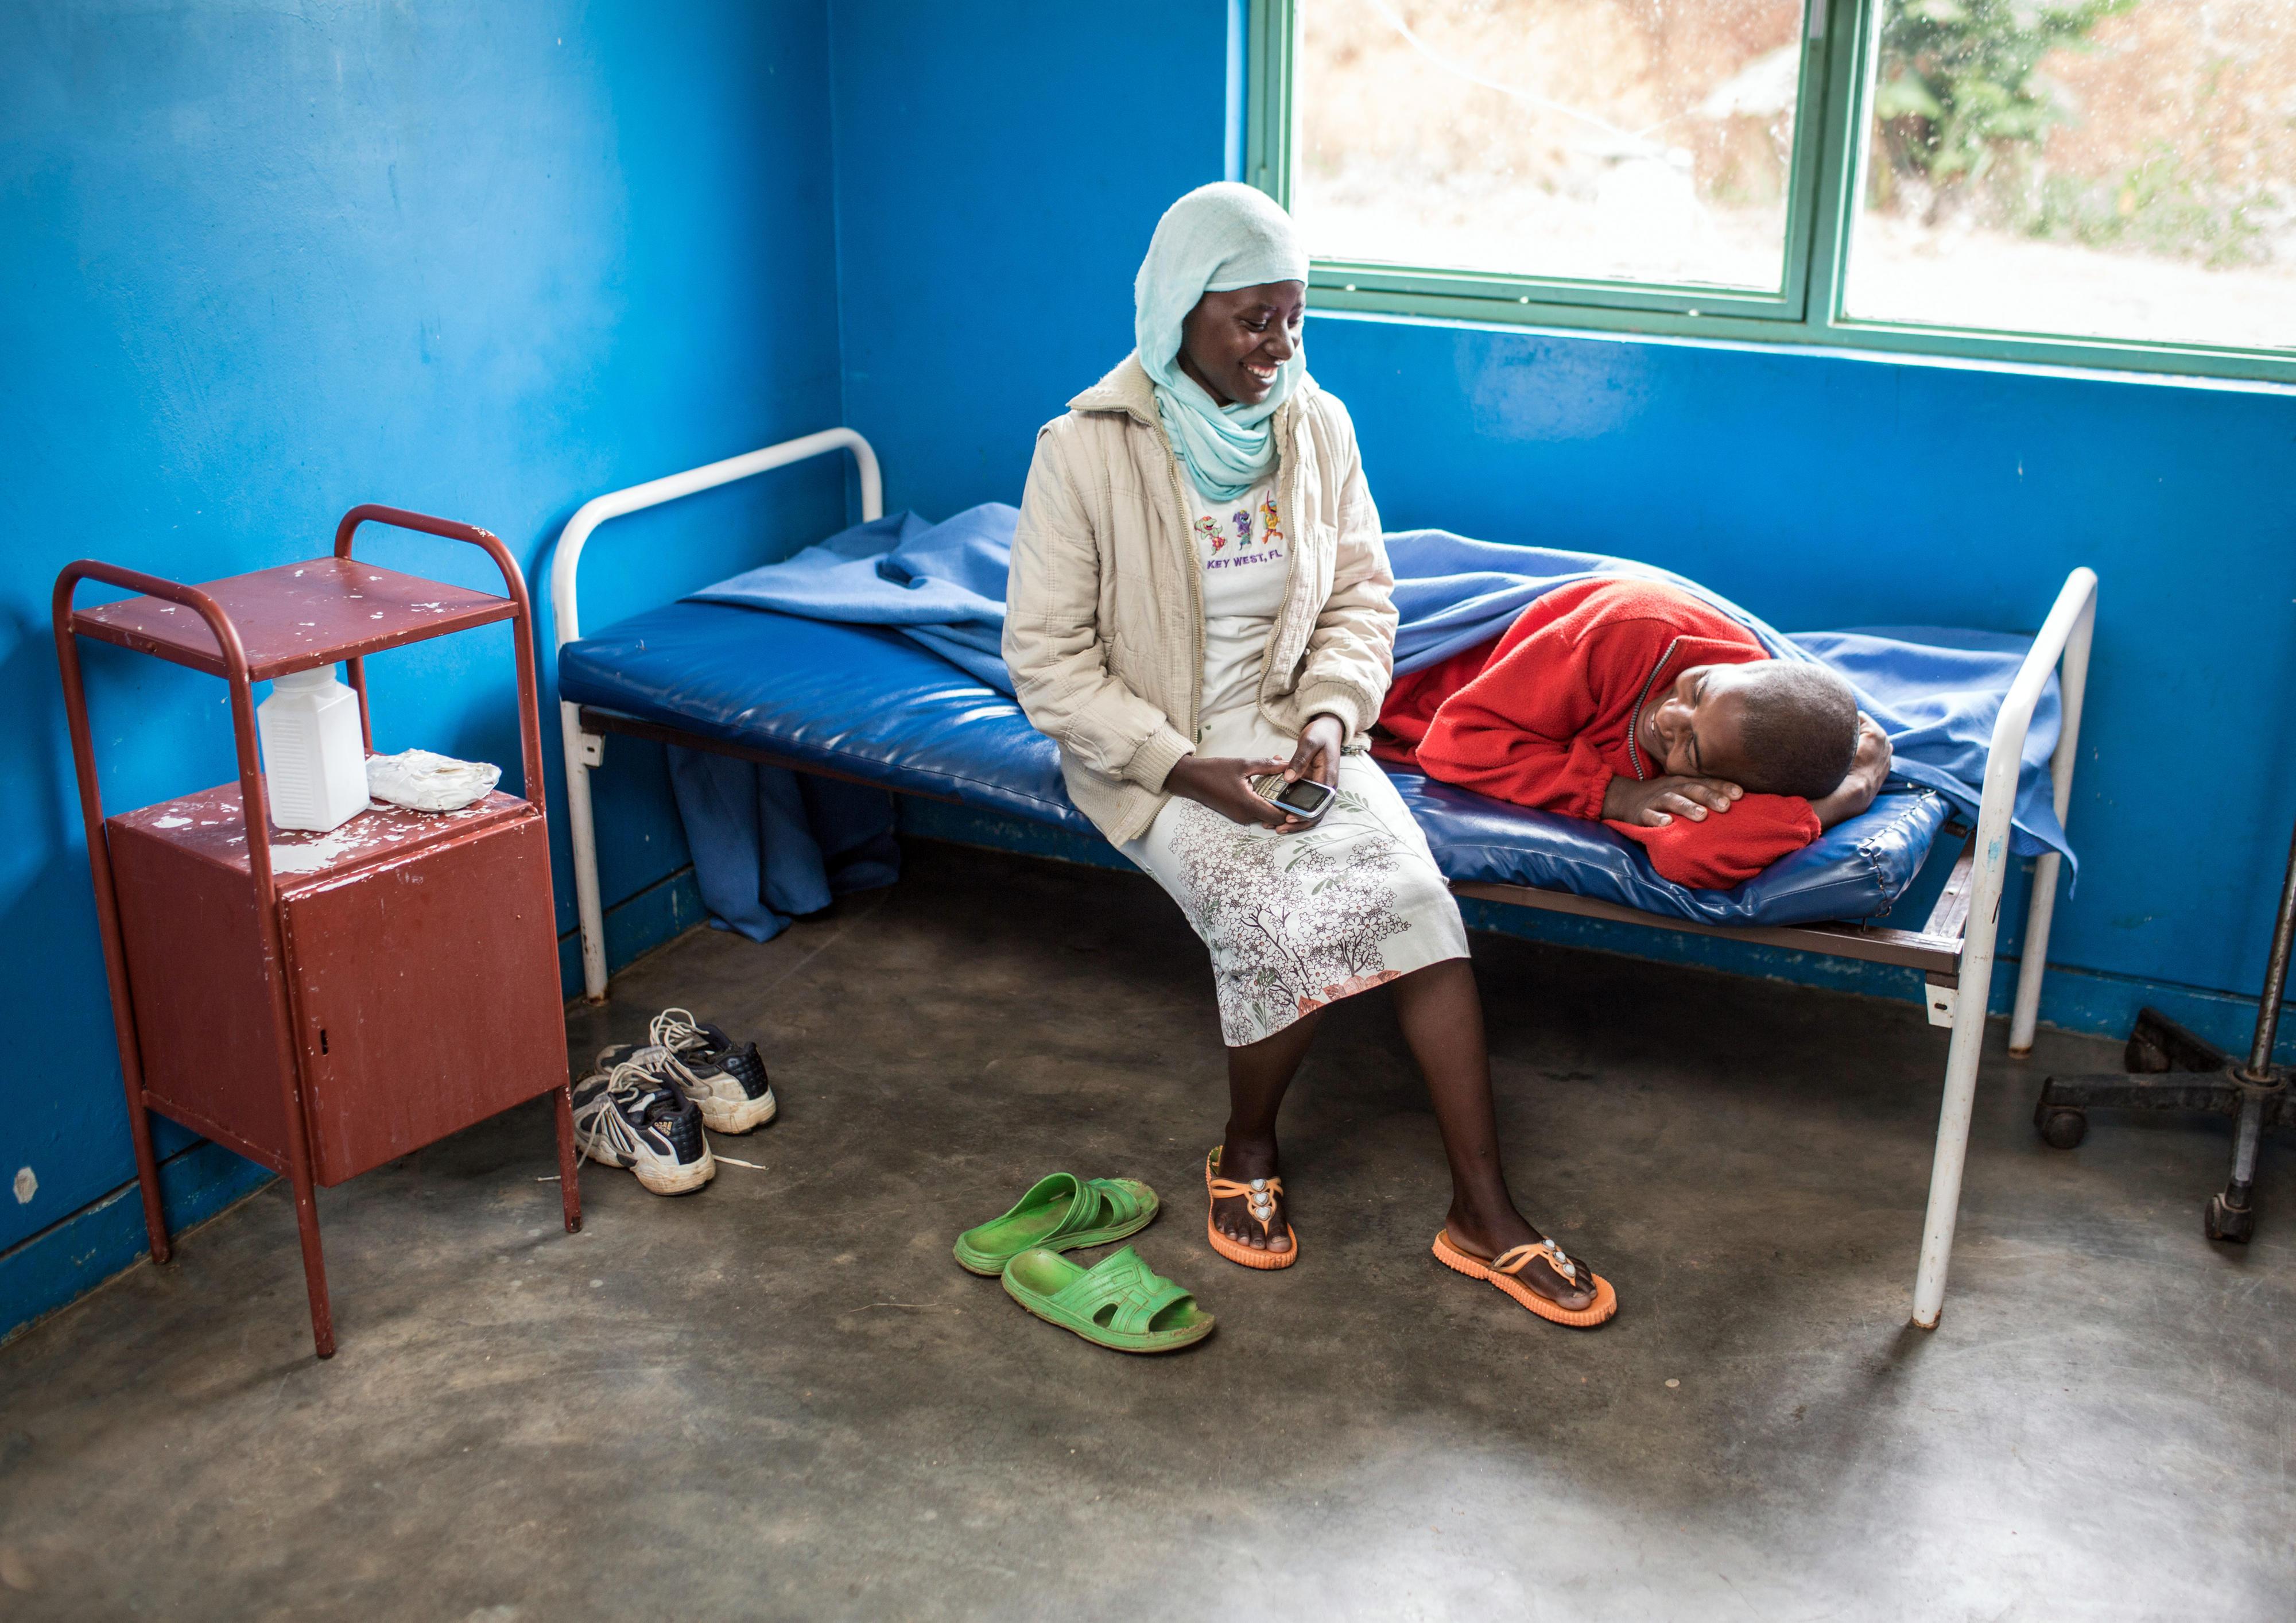 Ein Patientenzimmer im Gesundheitszentrum in Rubona, Ruanda